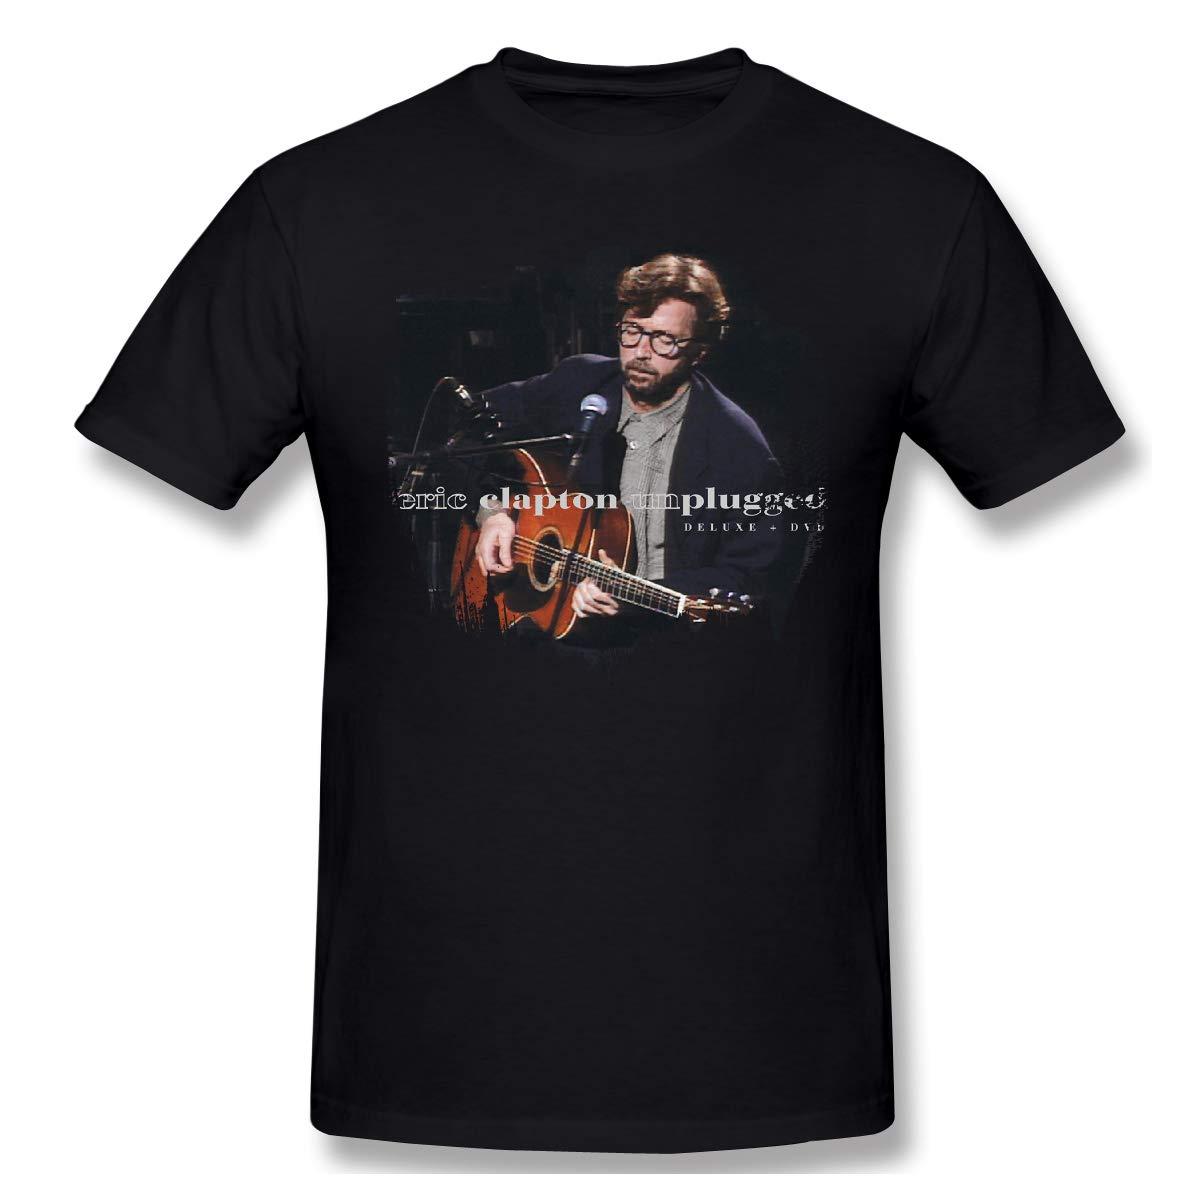 Eric Clapton Unplugged T Shirt